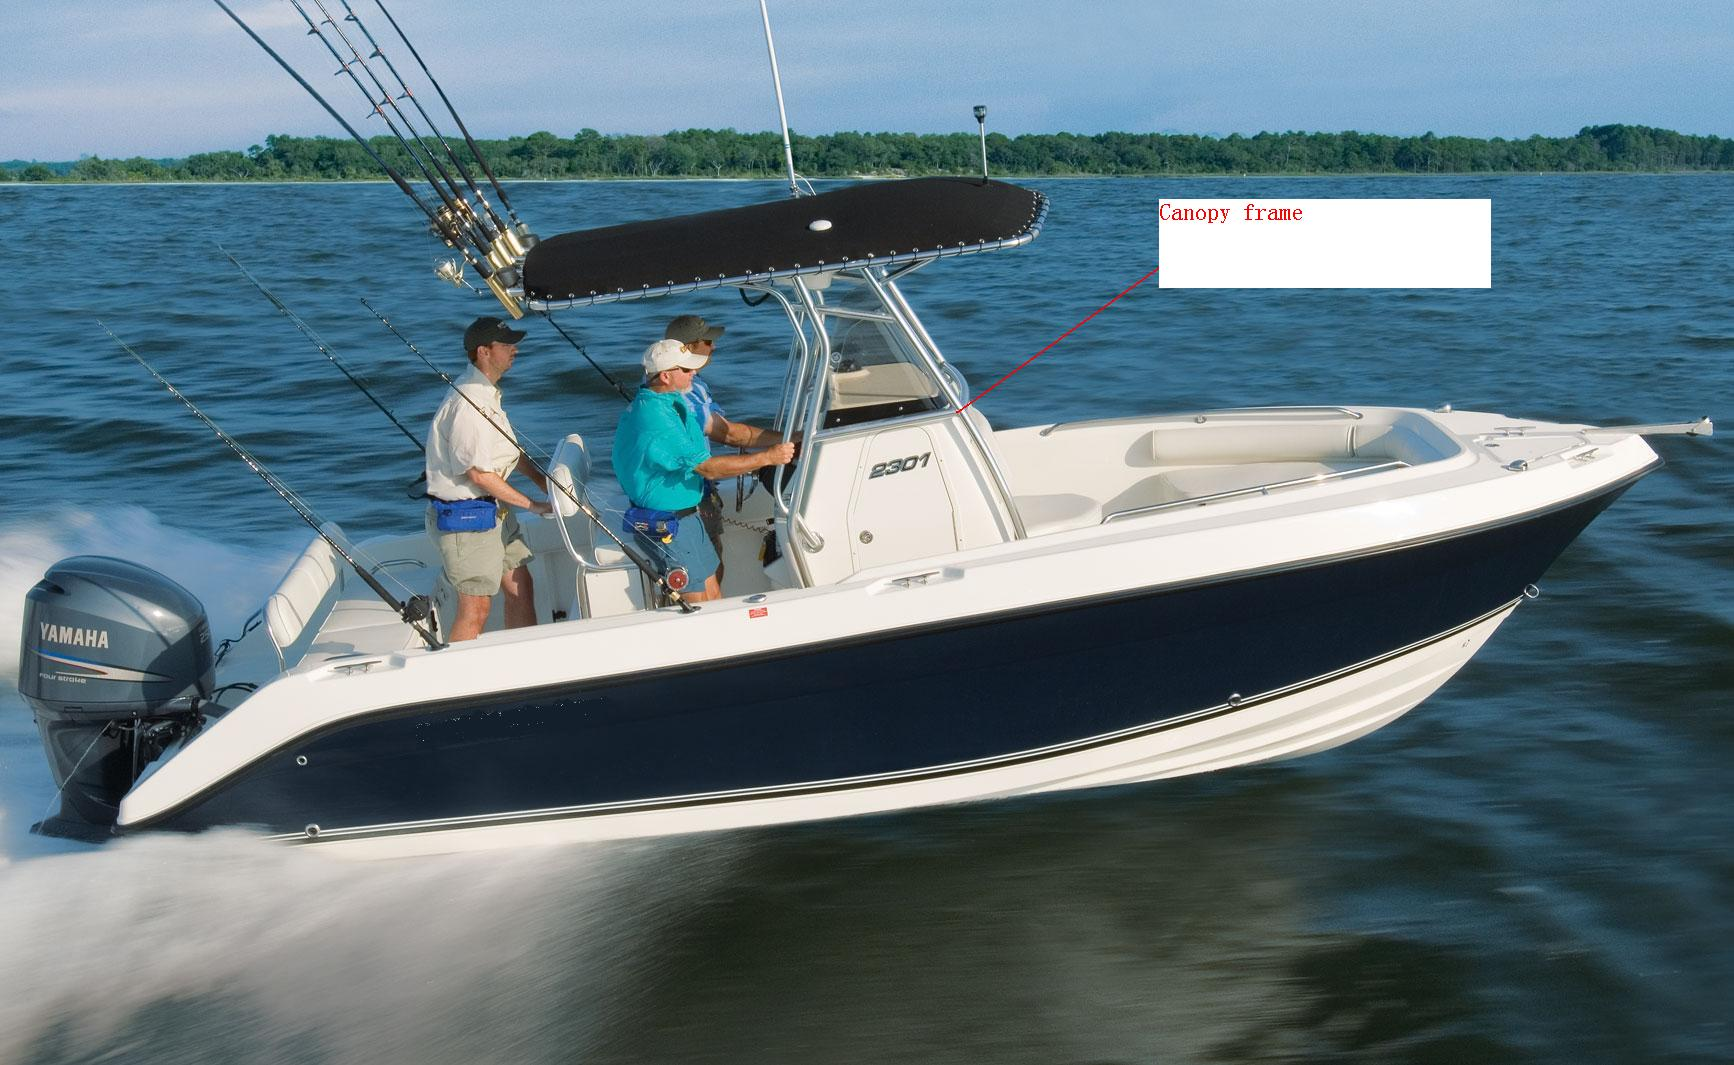 2301CC-running.jpg & Canopy frame material aluminium or stainless steel ? | Boat ...